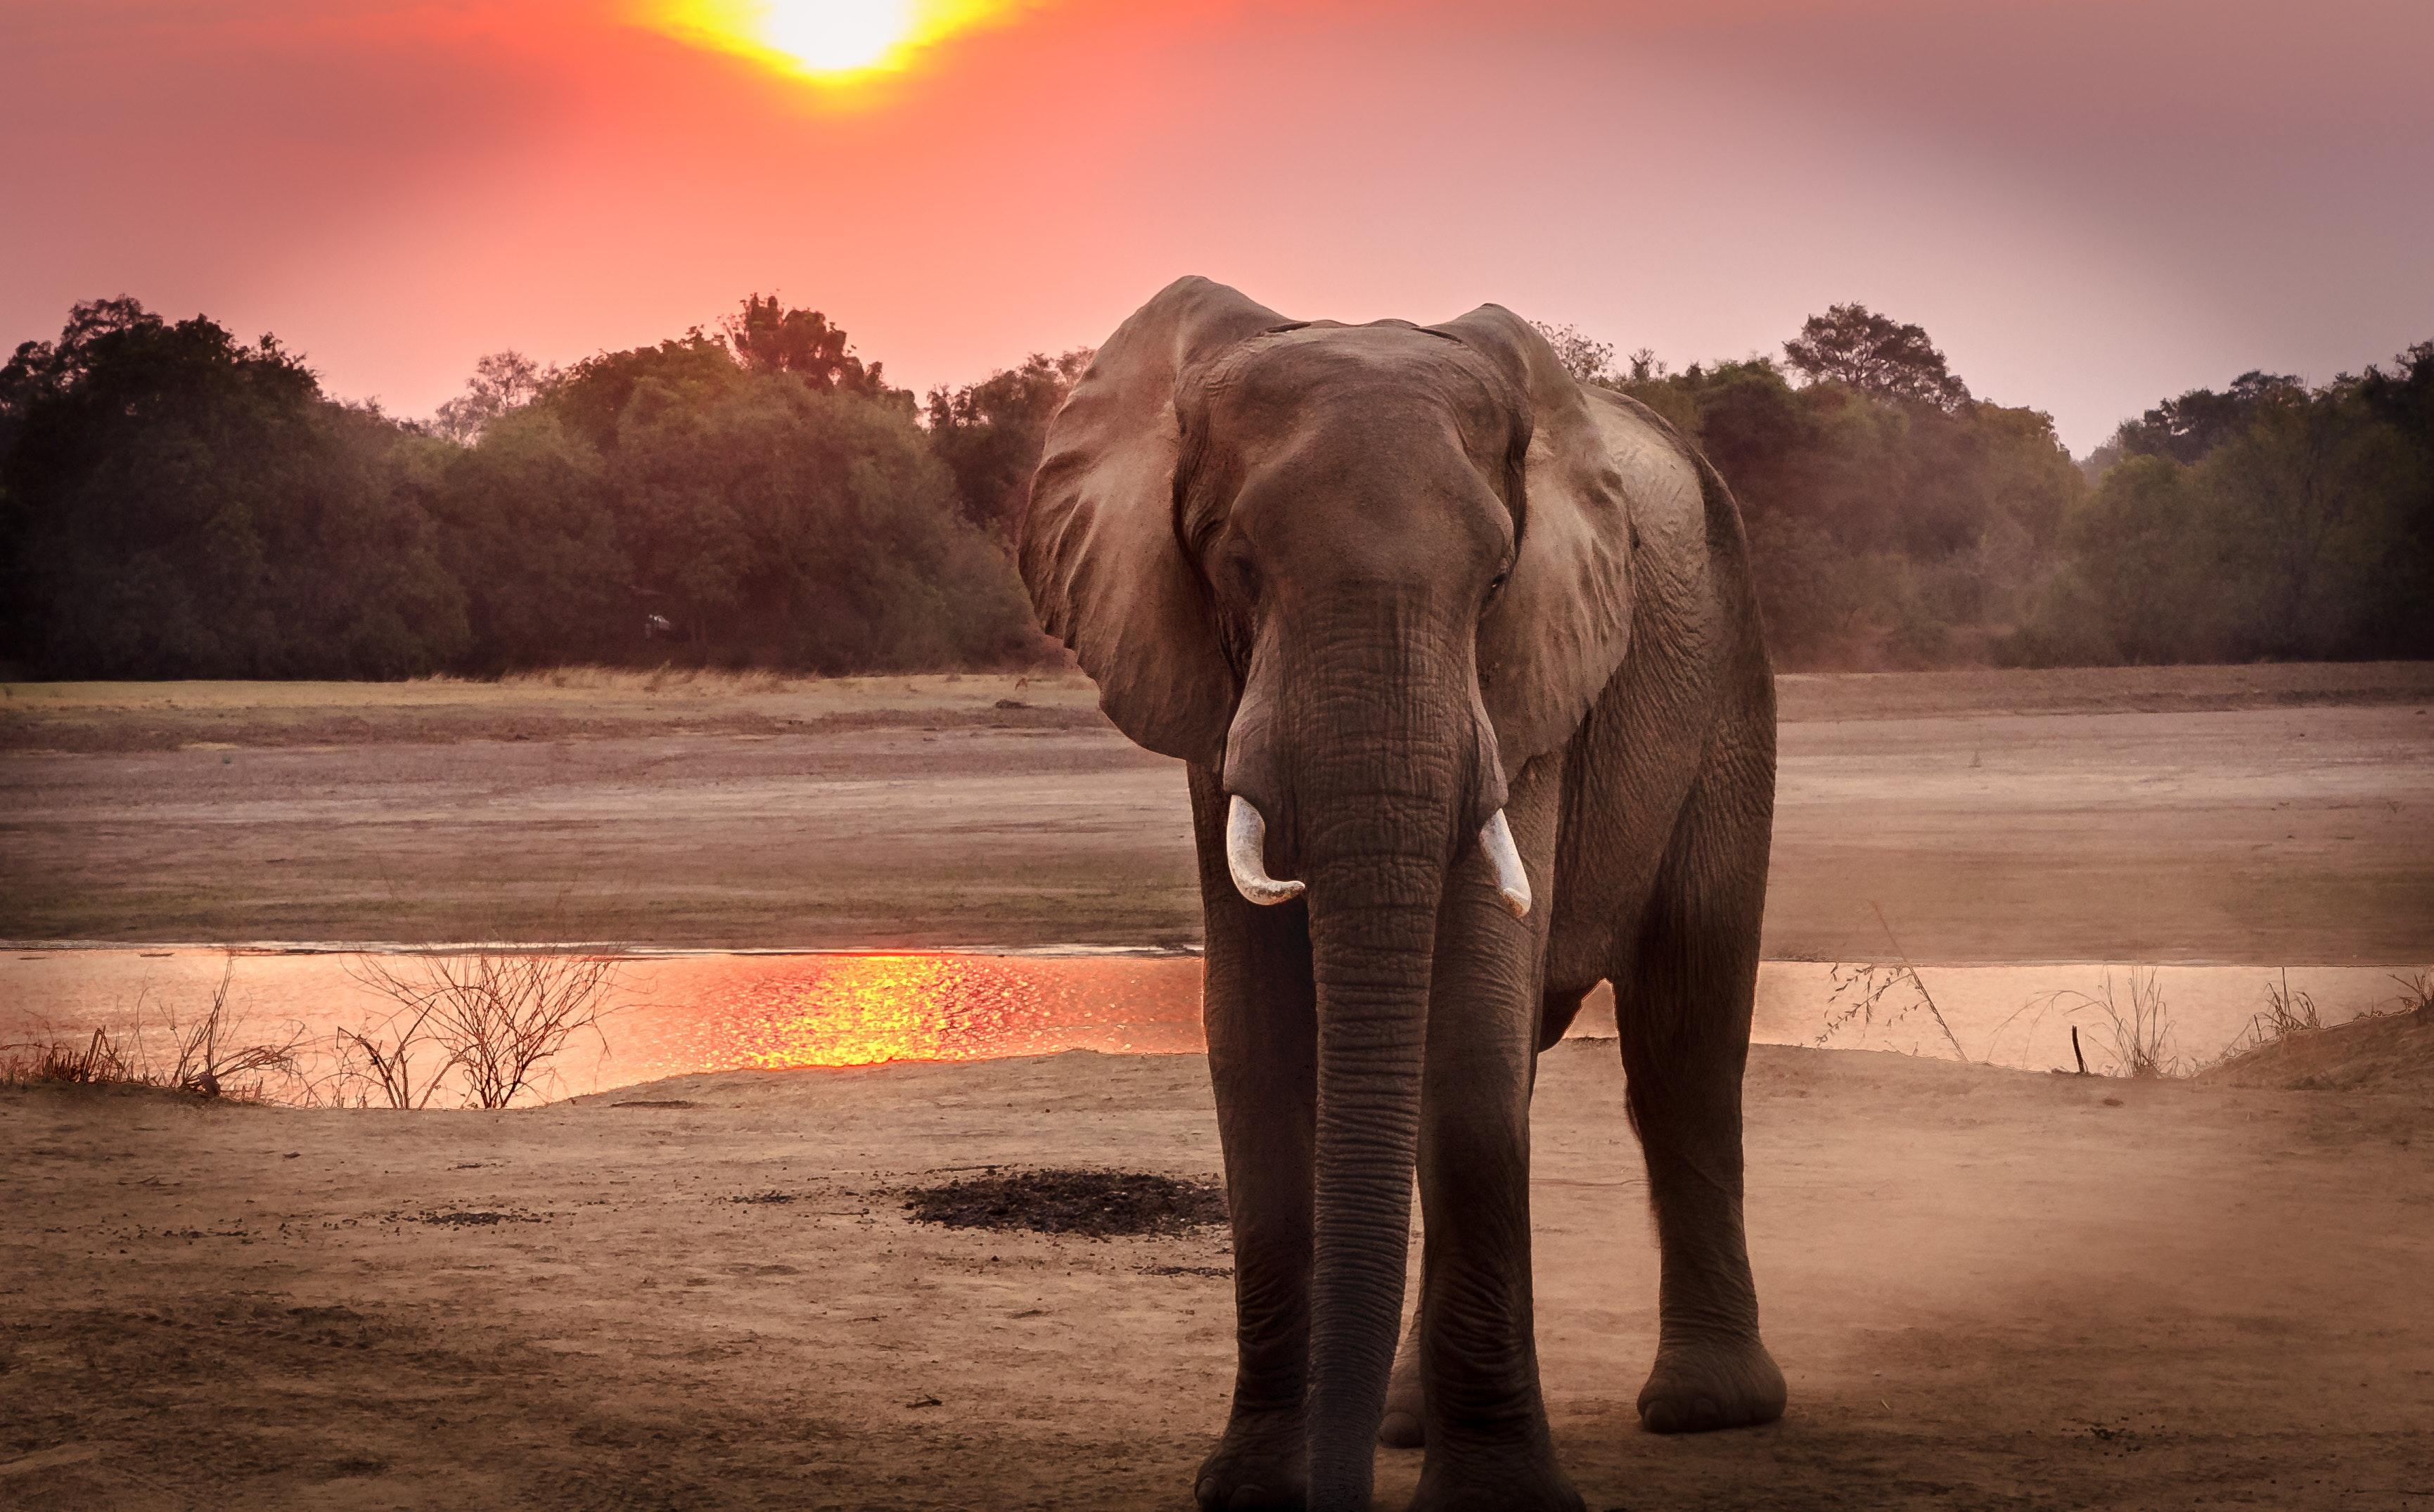 breathtaking elephant photos 183 pexels 183 free stock photos